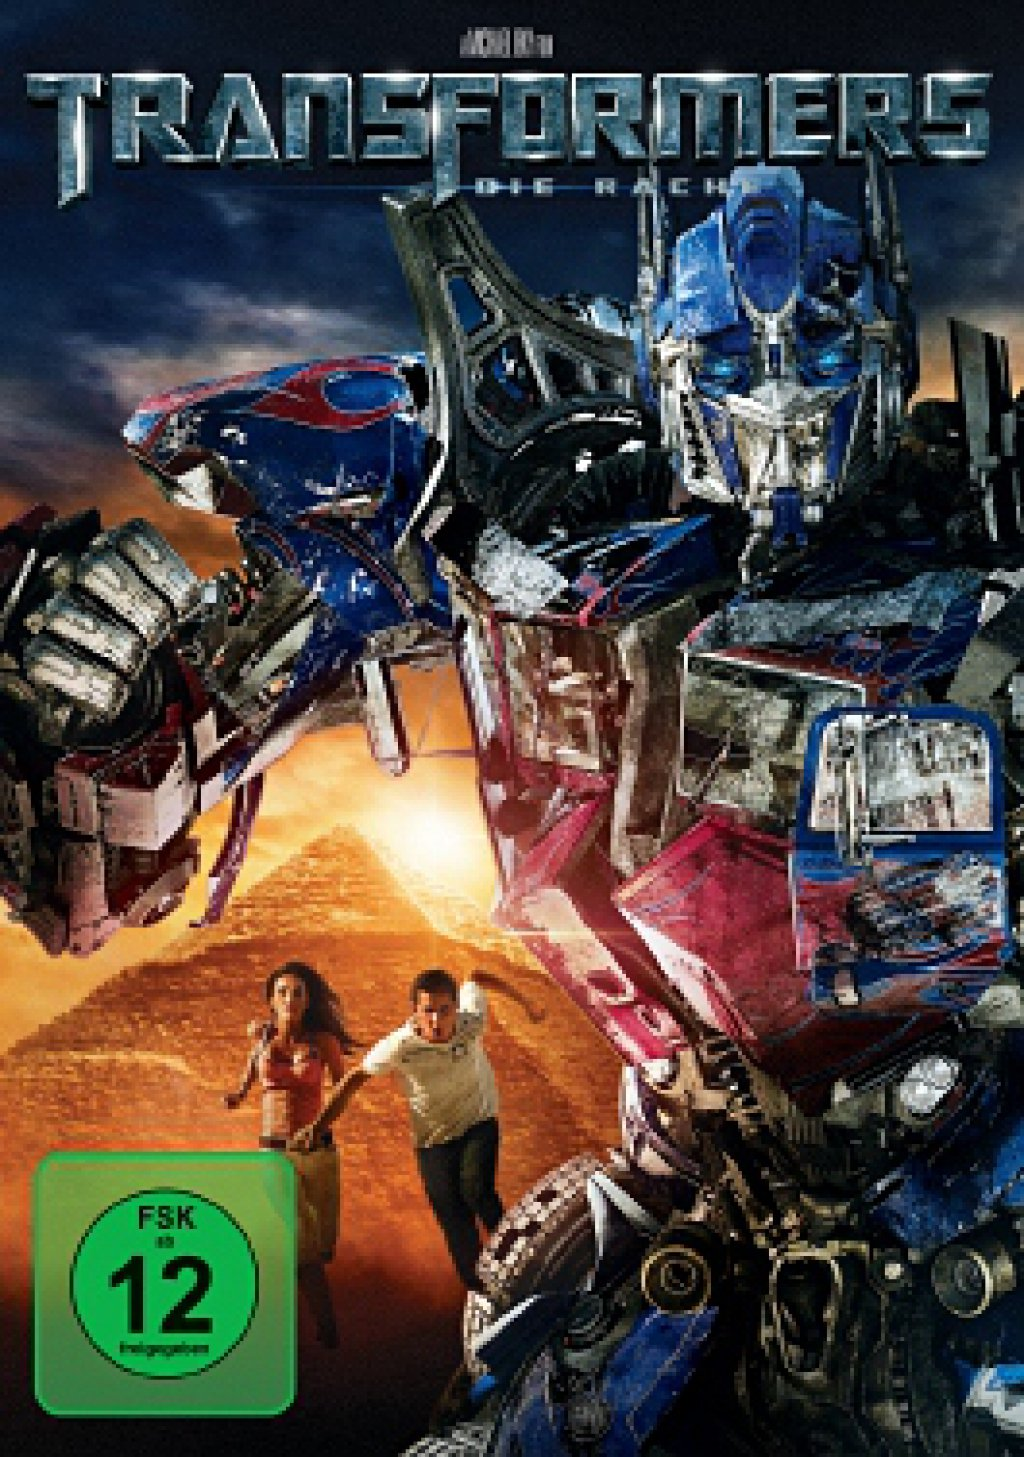 Transformers - Die Rache (DVD)